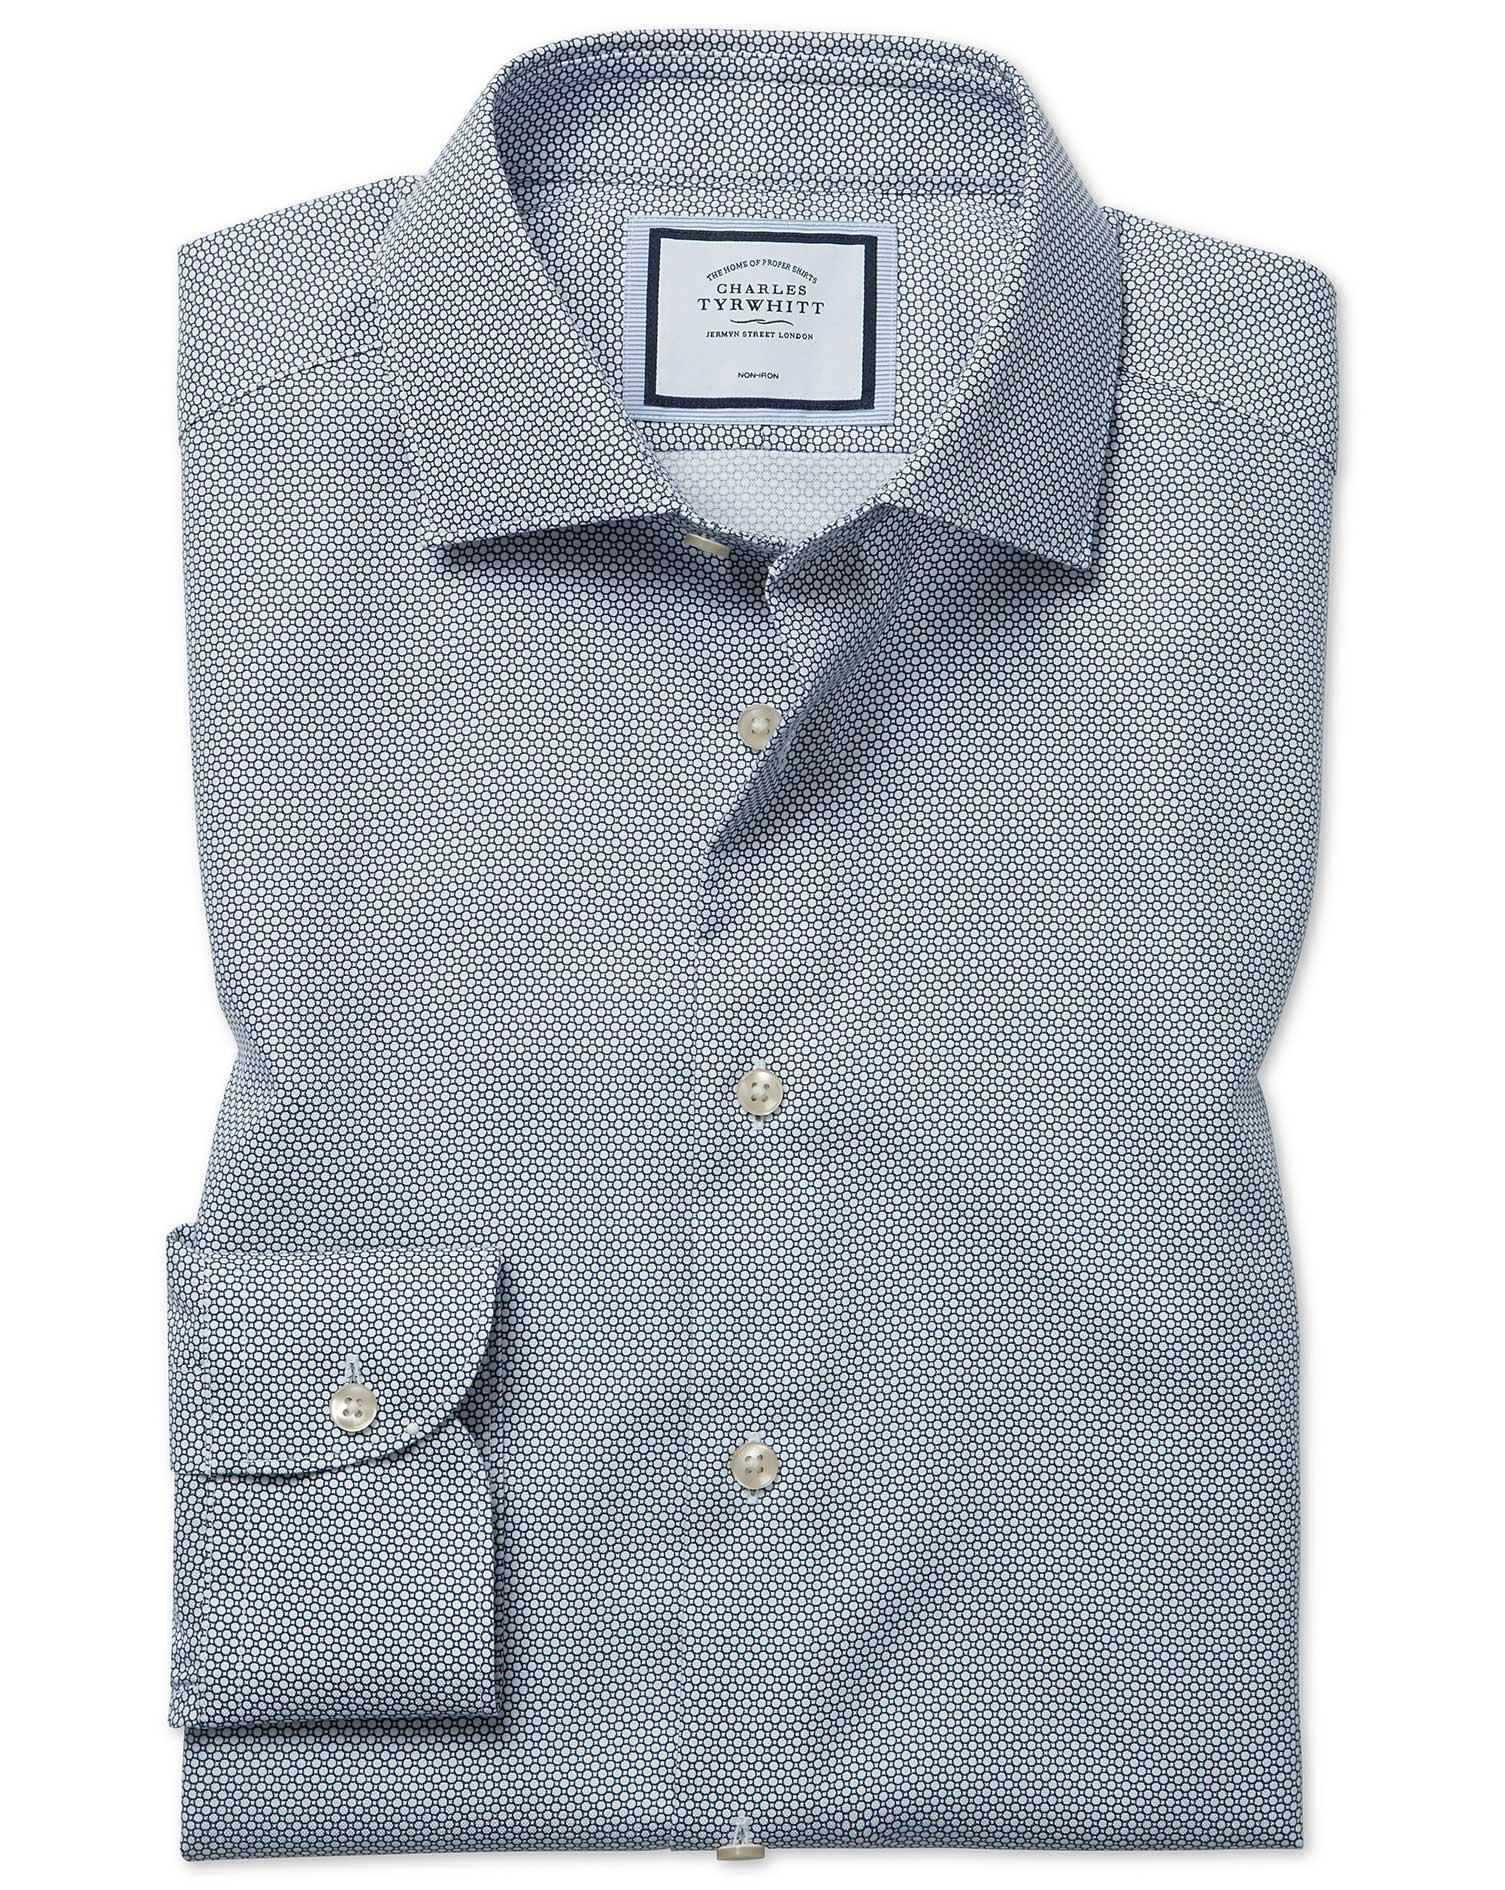 Cotton Extra Slim Fit Non-Iron Circle Print Navy Shirt